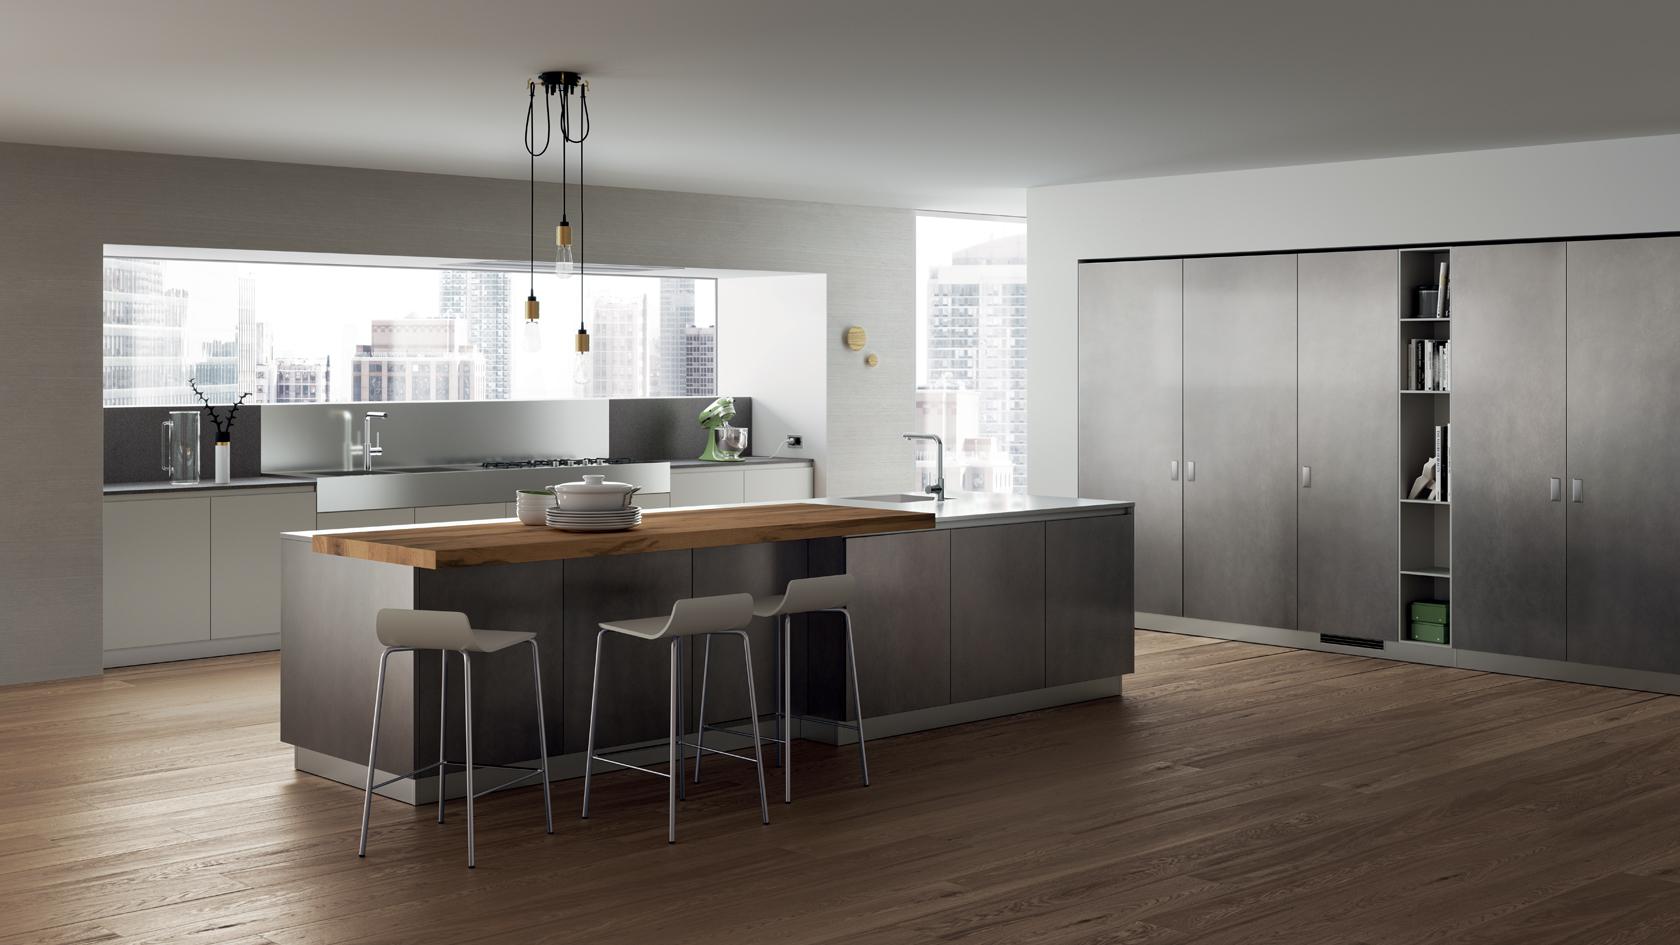 Foodshelf kitchen dillon amber dane barbados showroom for Scavolini kitchens